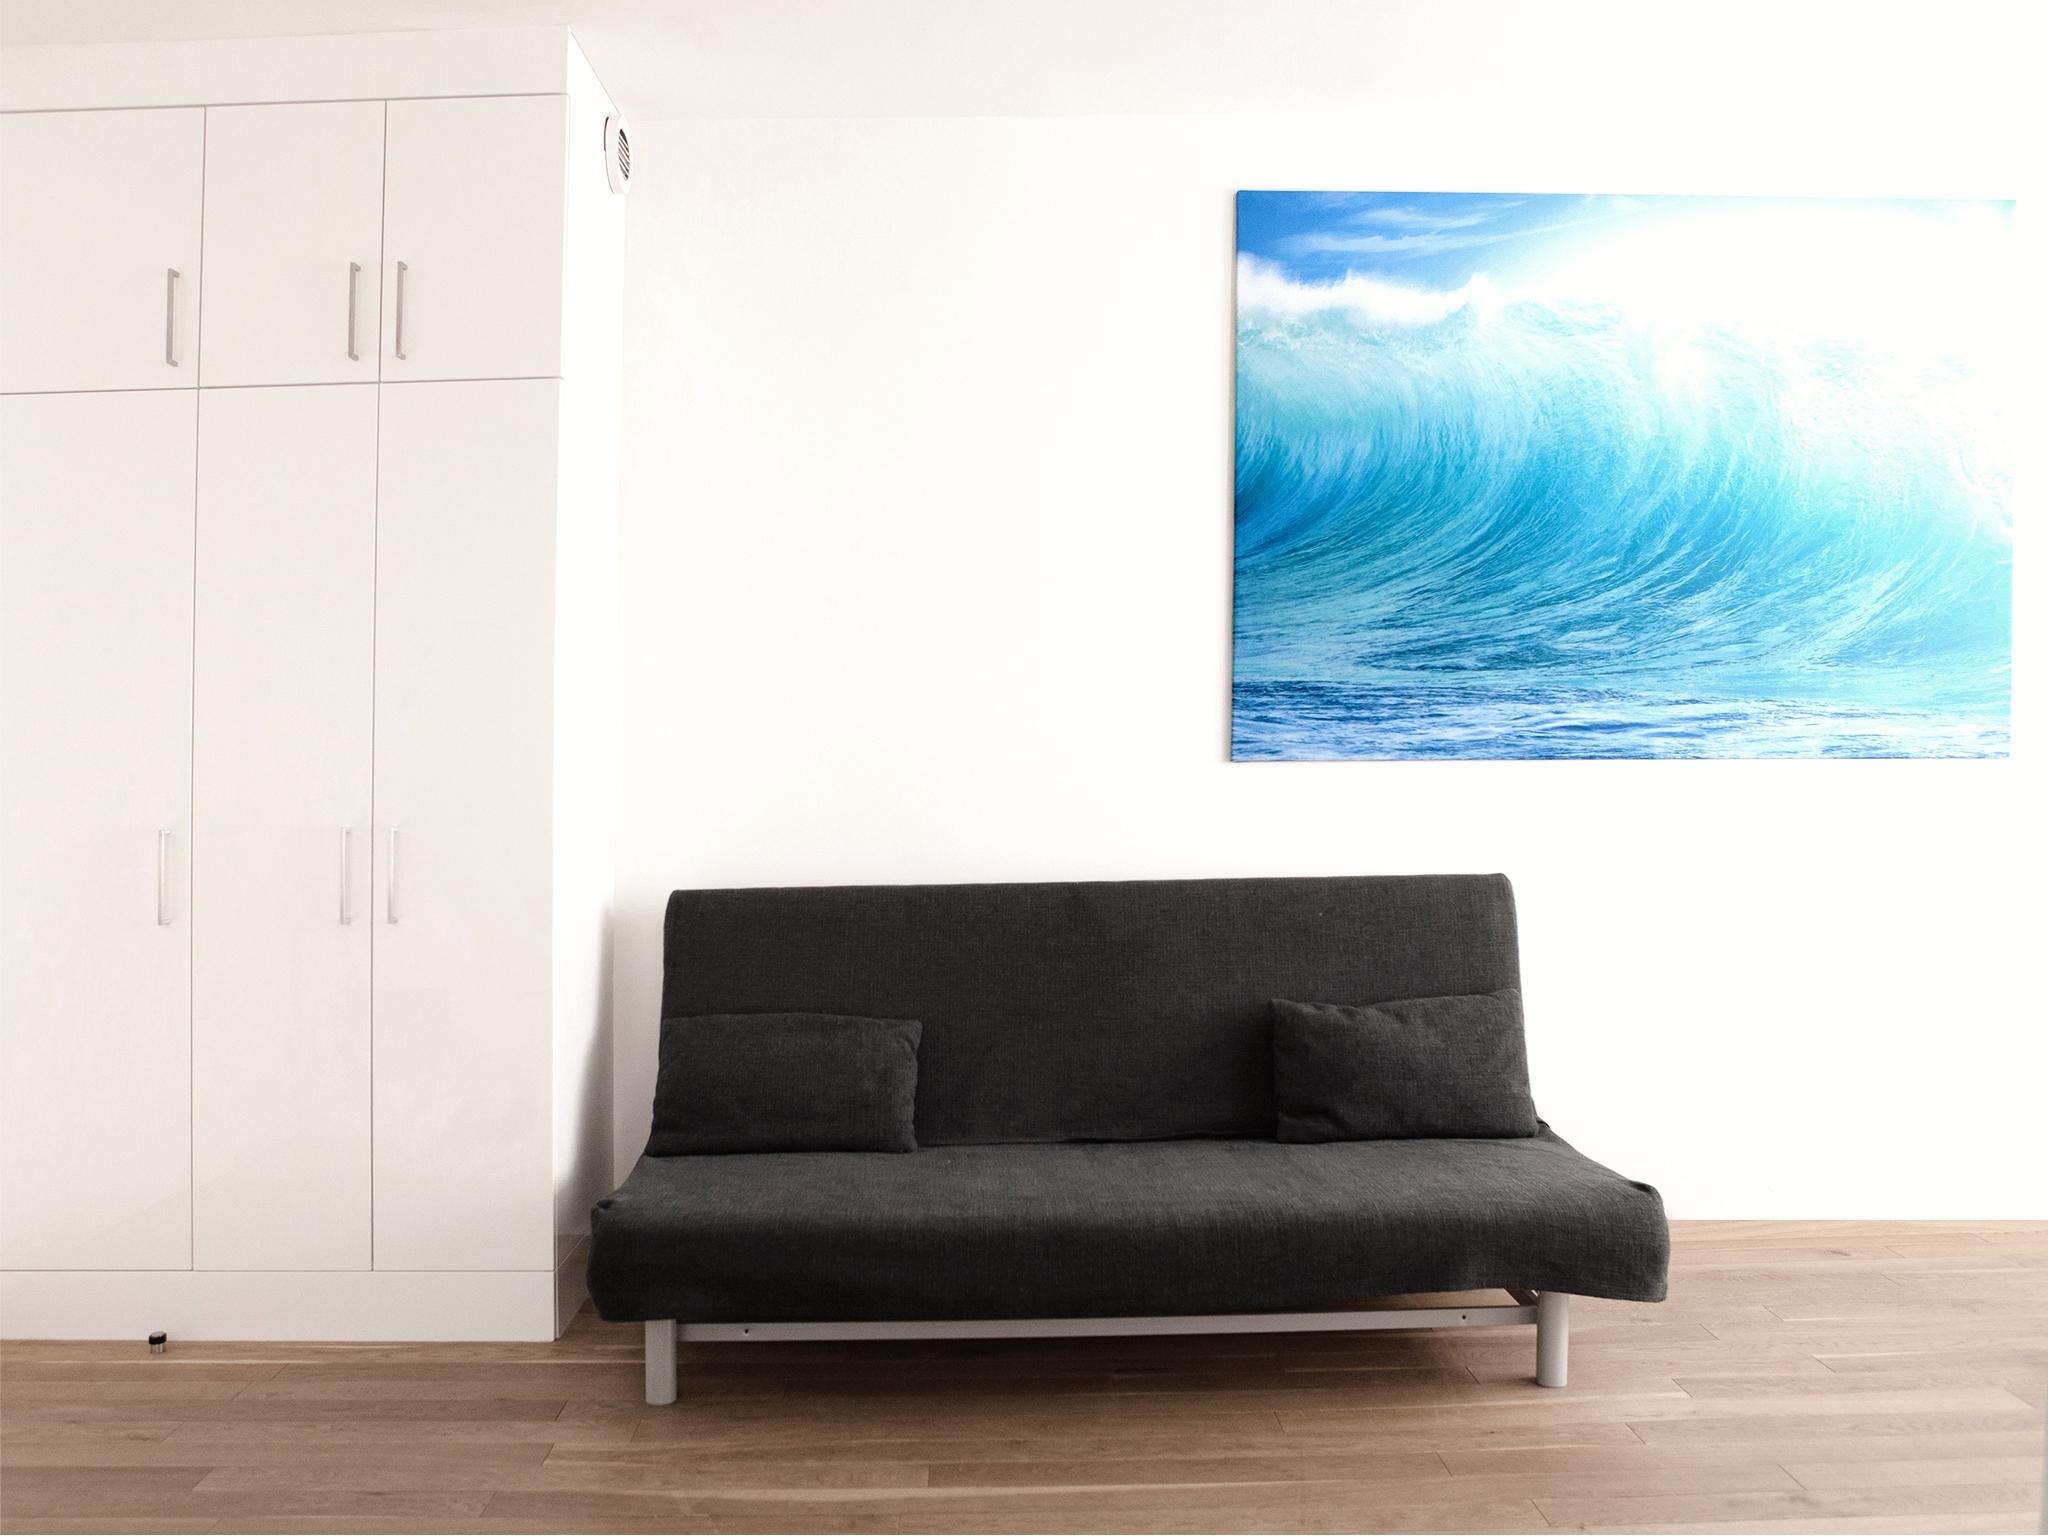 Apartment Wasser Wohnraum Sofa